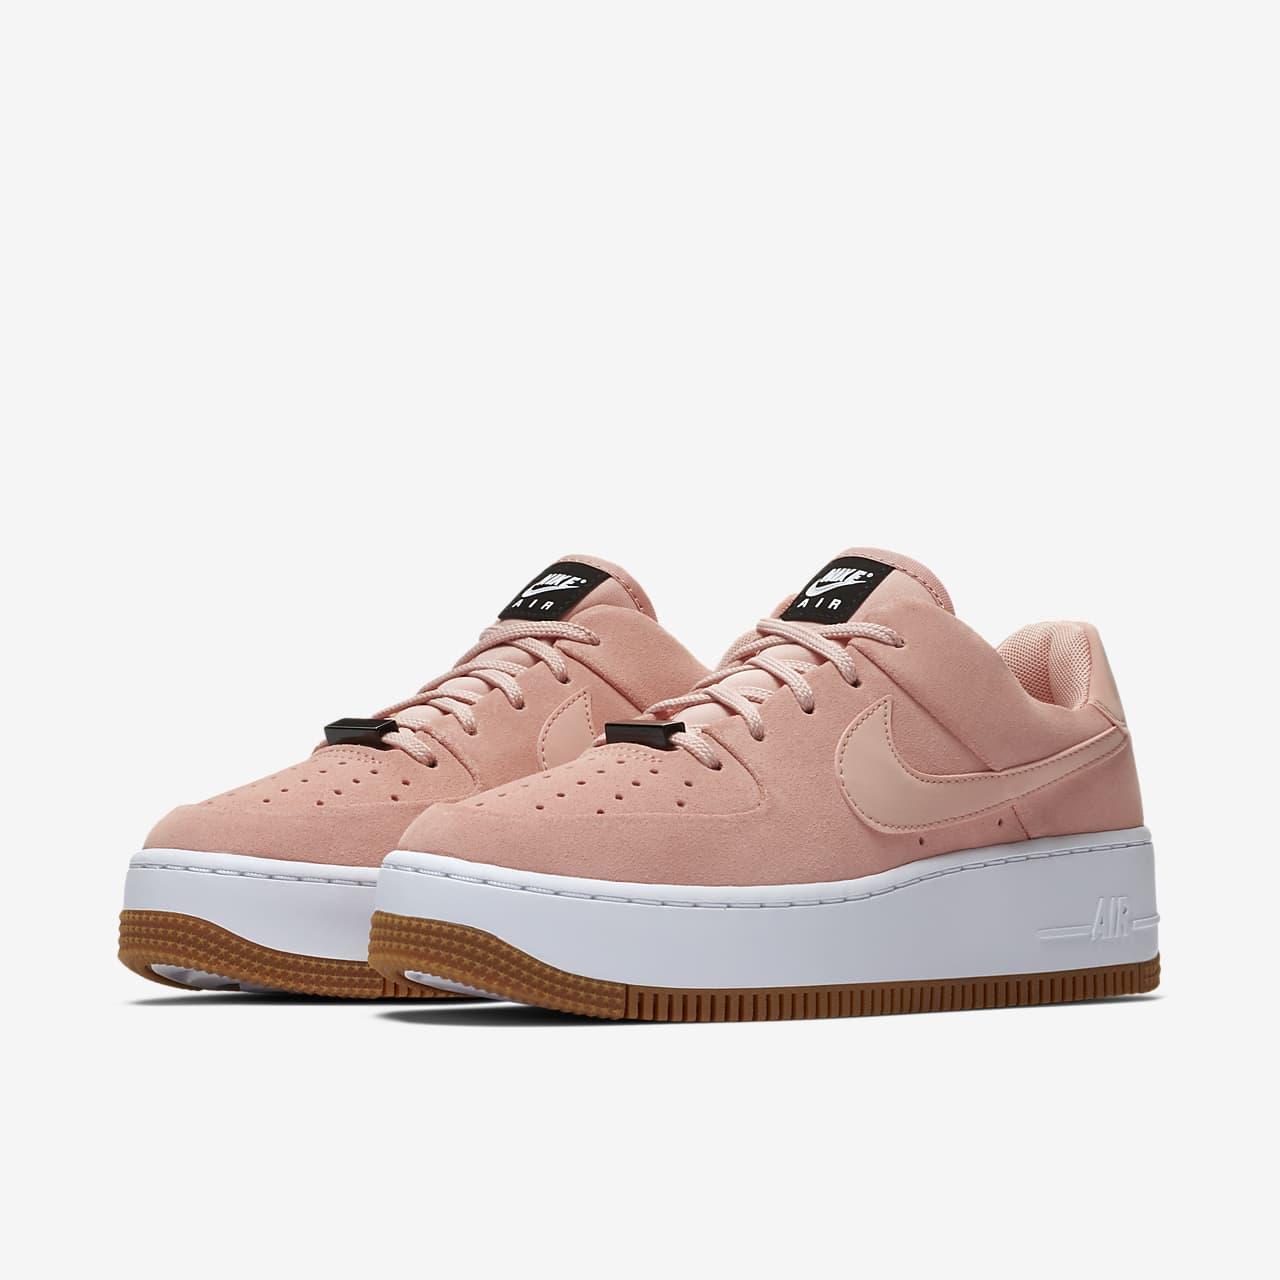 nike air force one sage low pink